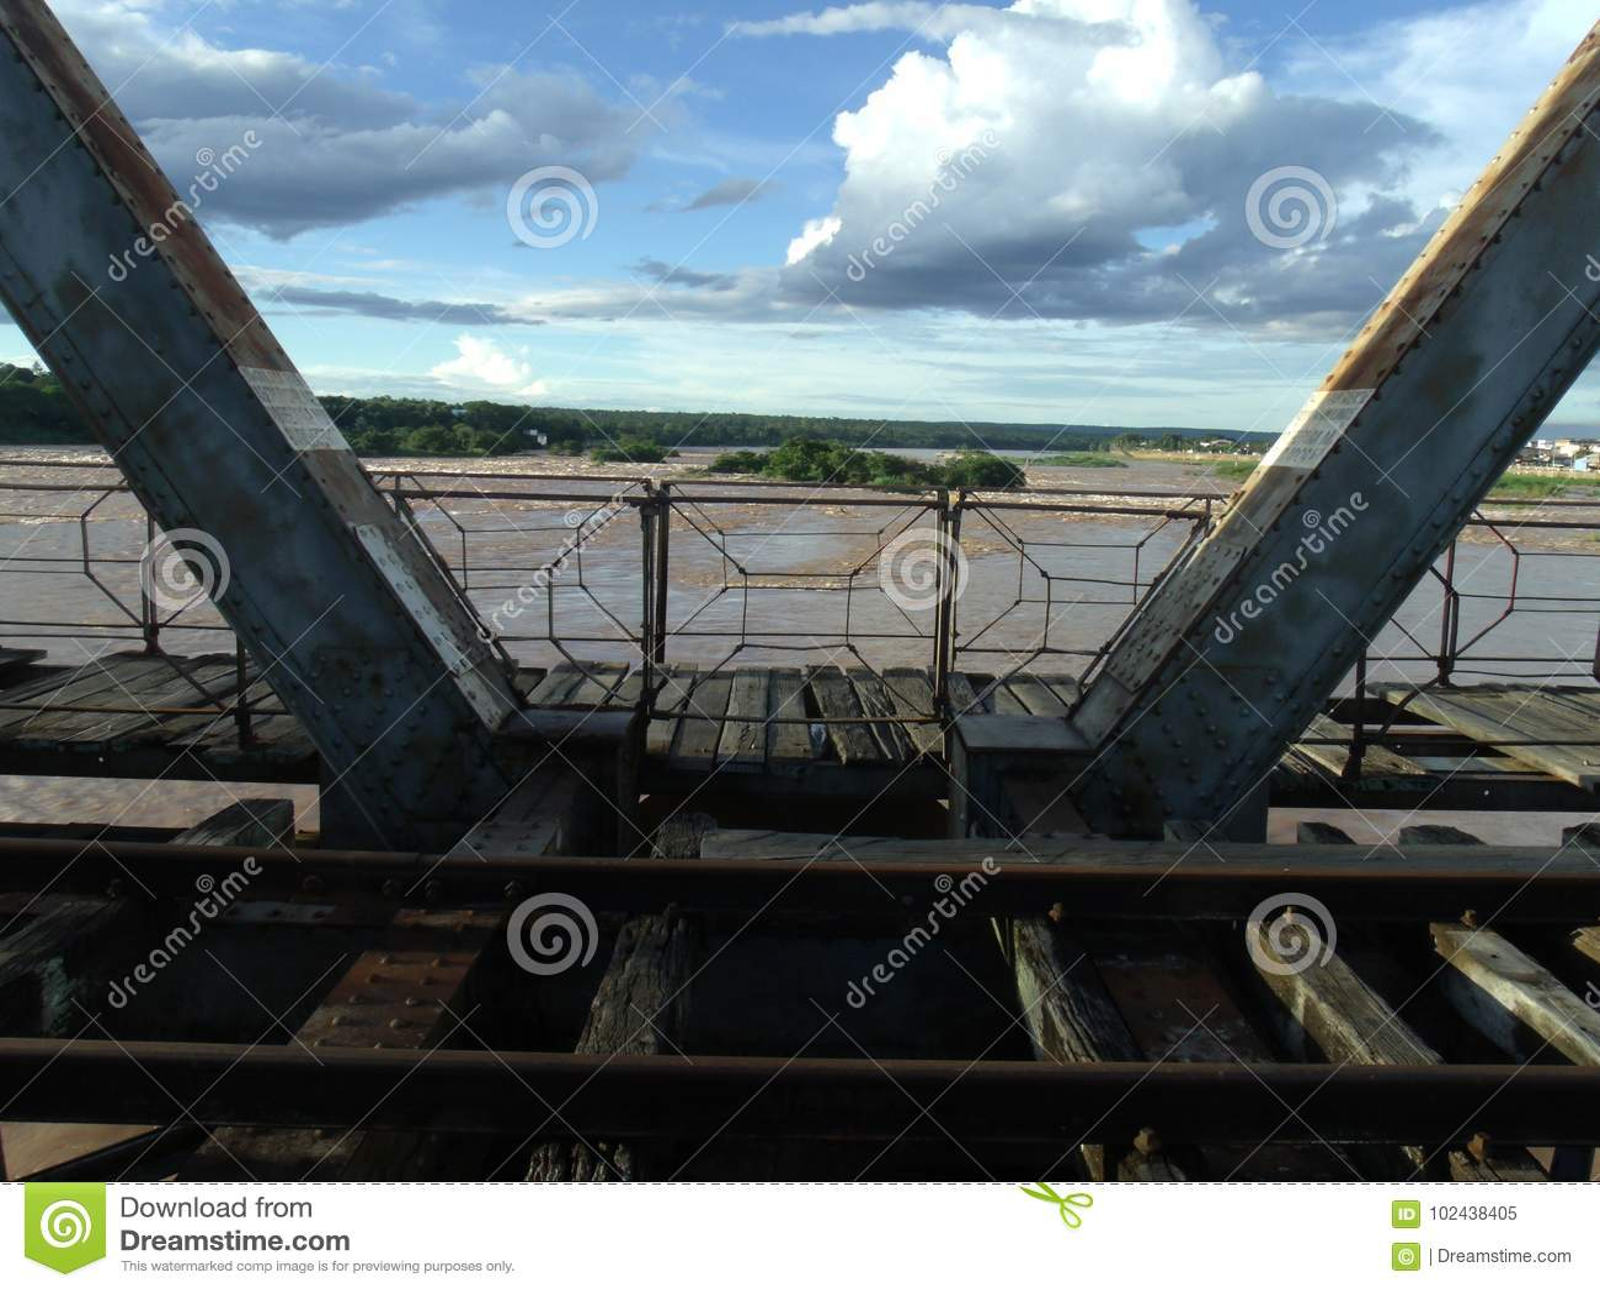 Water under the bridge  stock image  Image of water - 102438405